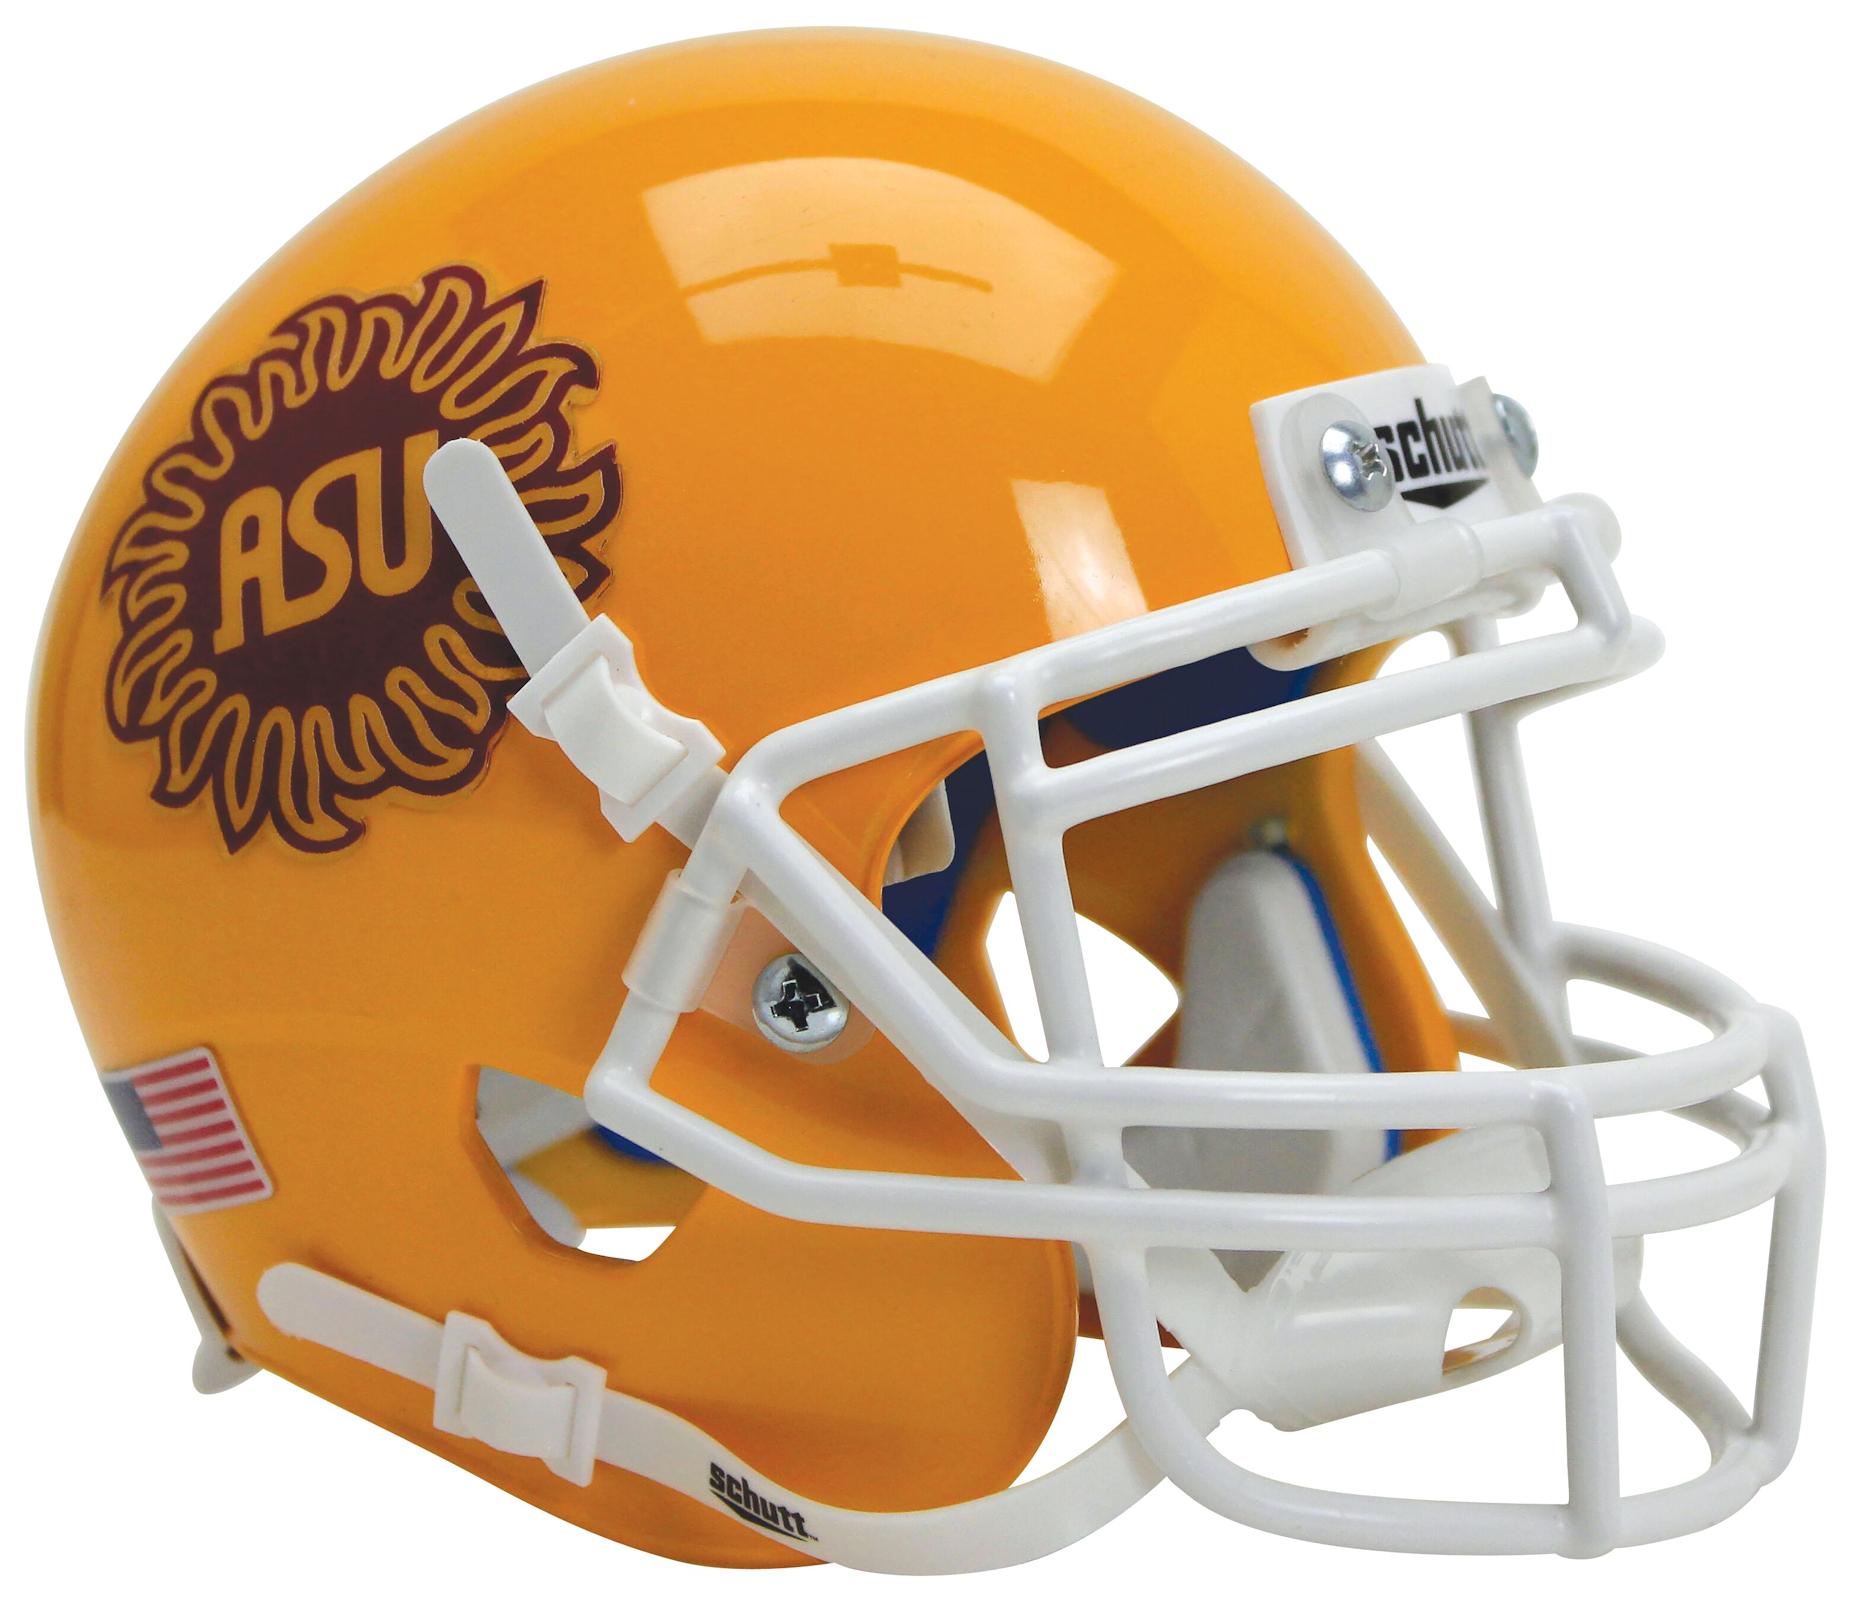 Arizona State Sun Devils Mini XP Authentic Helmet Schutt <B>Sunburst</B>